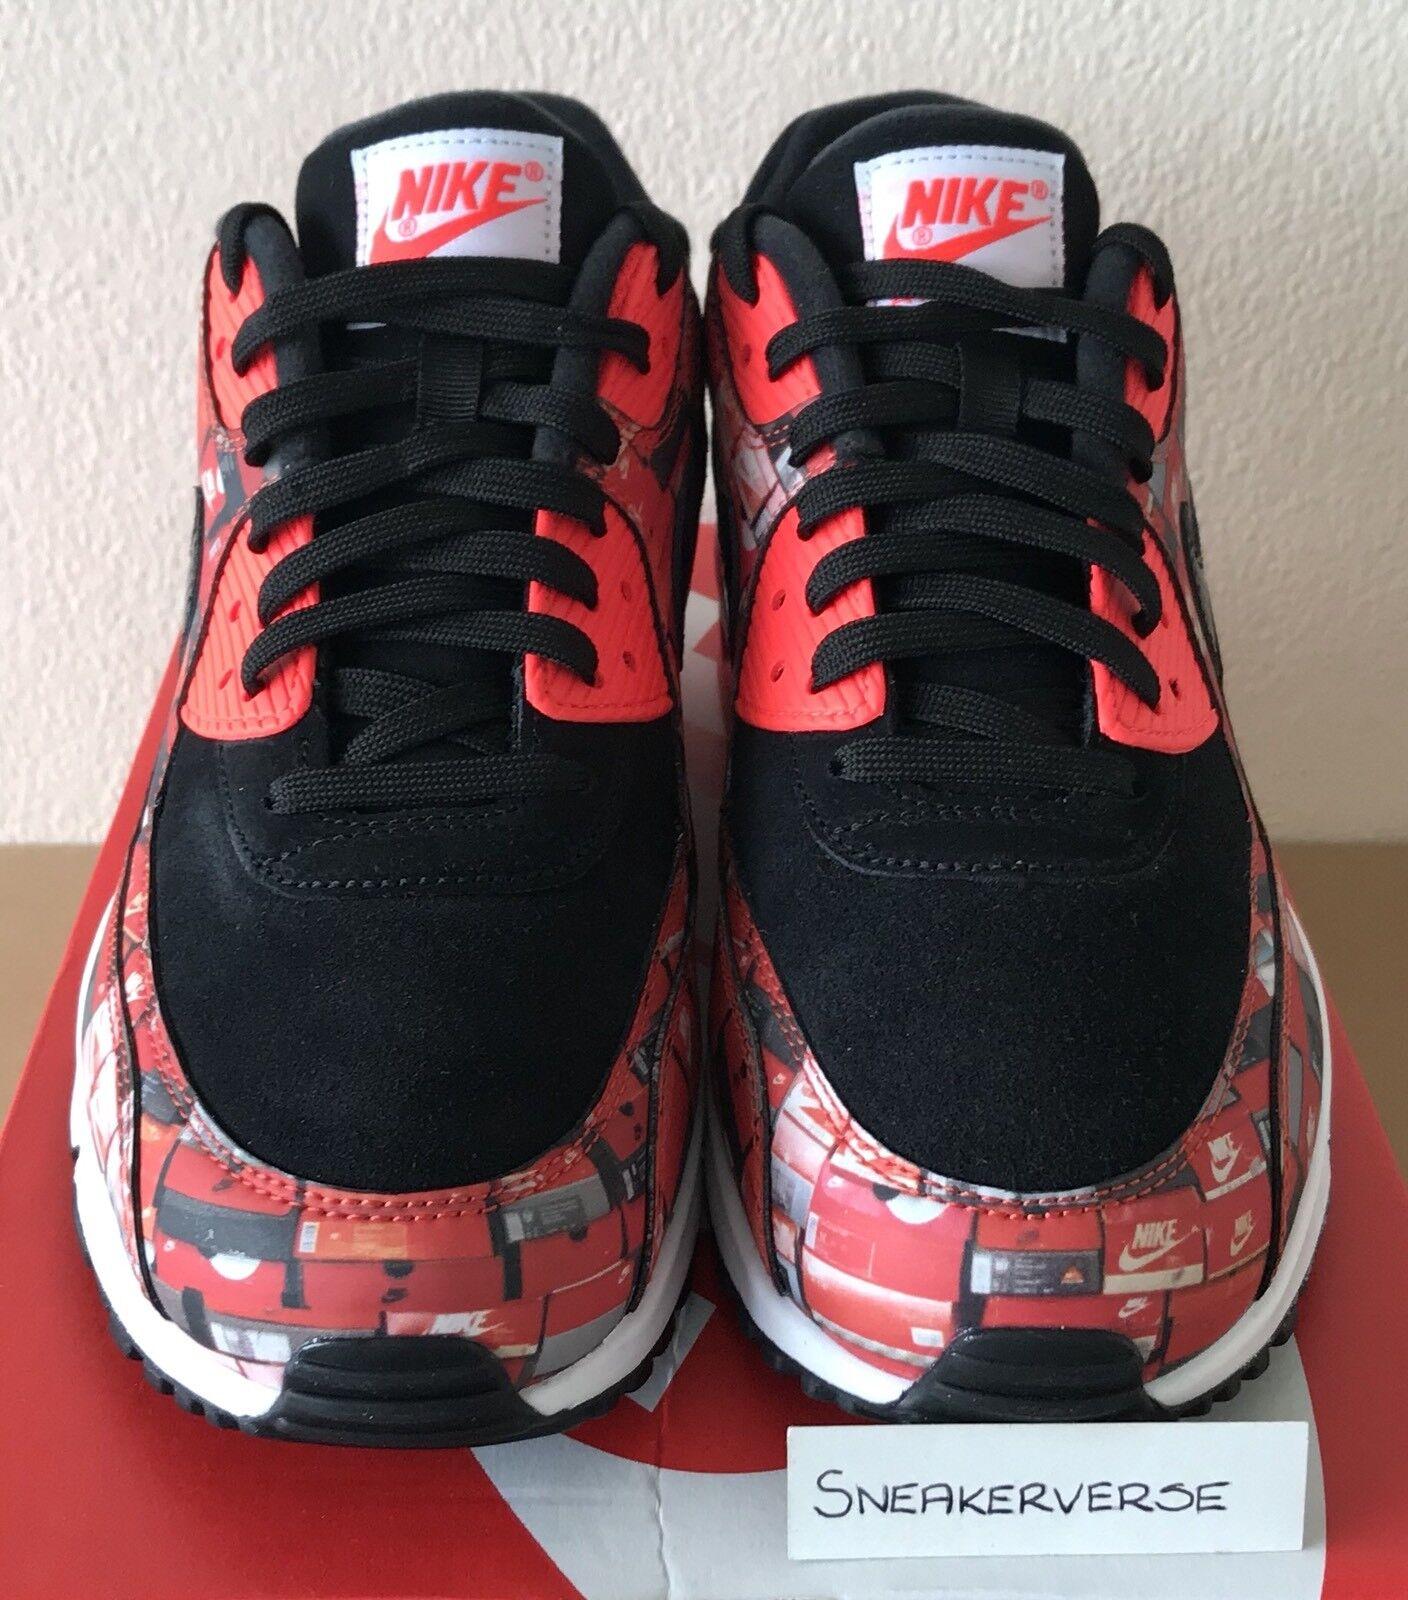 209c3144b73c Nike Nike Nike x Atmos Air Max 90 Print  We Love Nike  Black Red Grey  AQ0926 001 1b7417